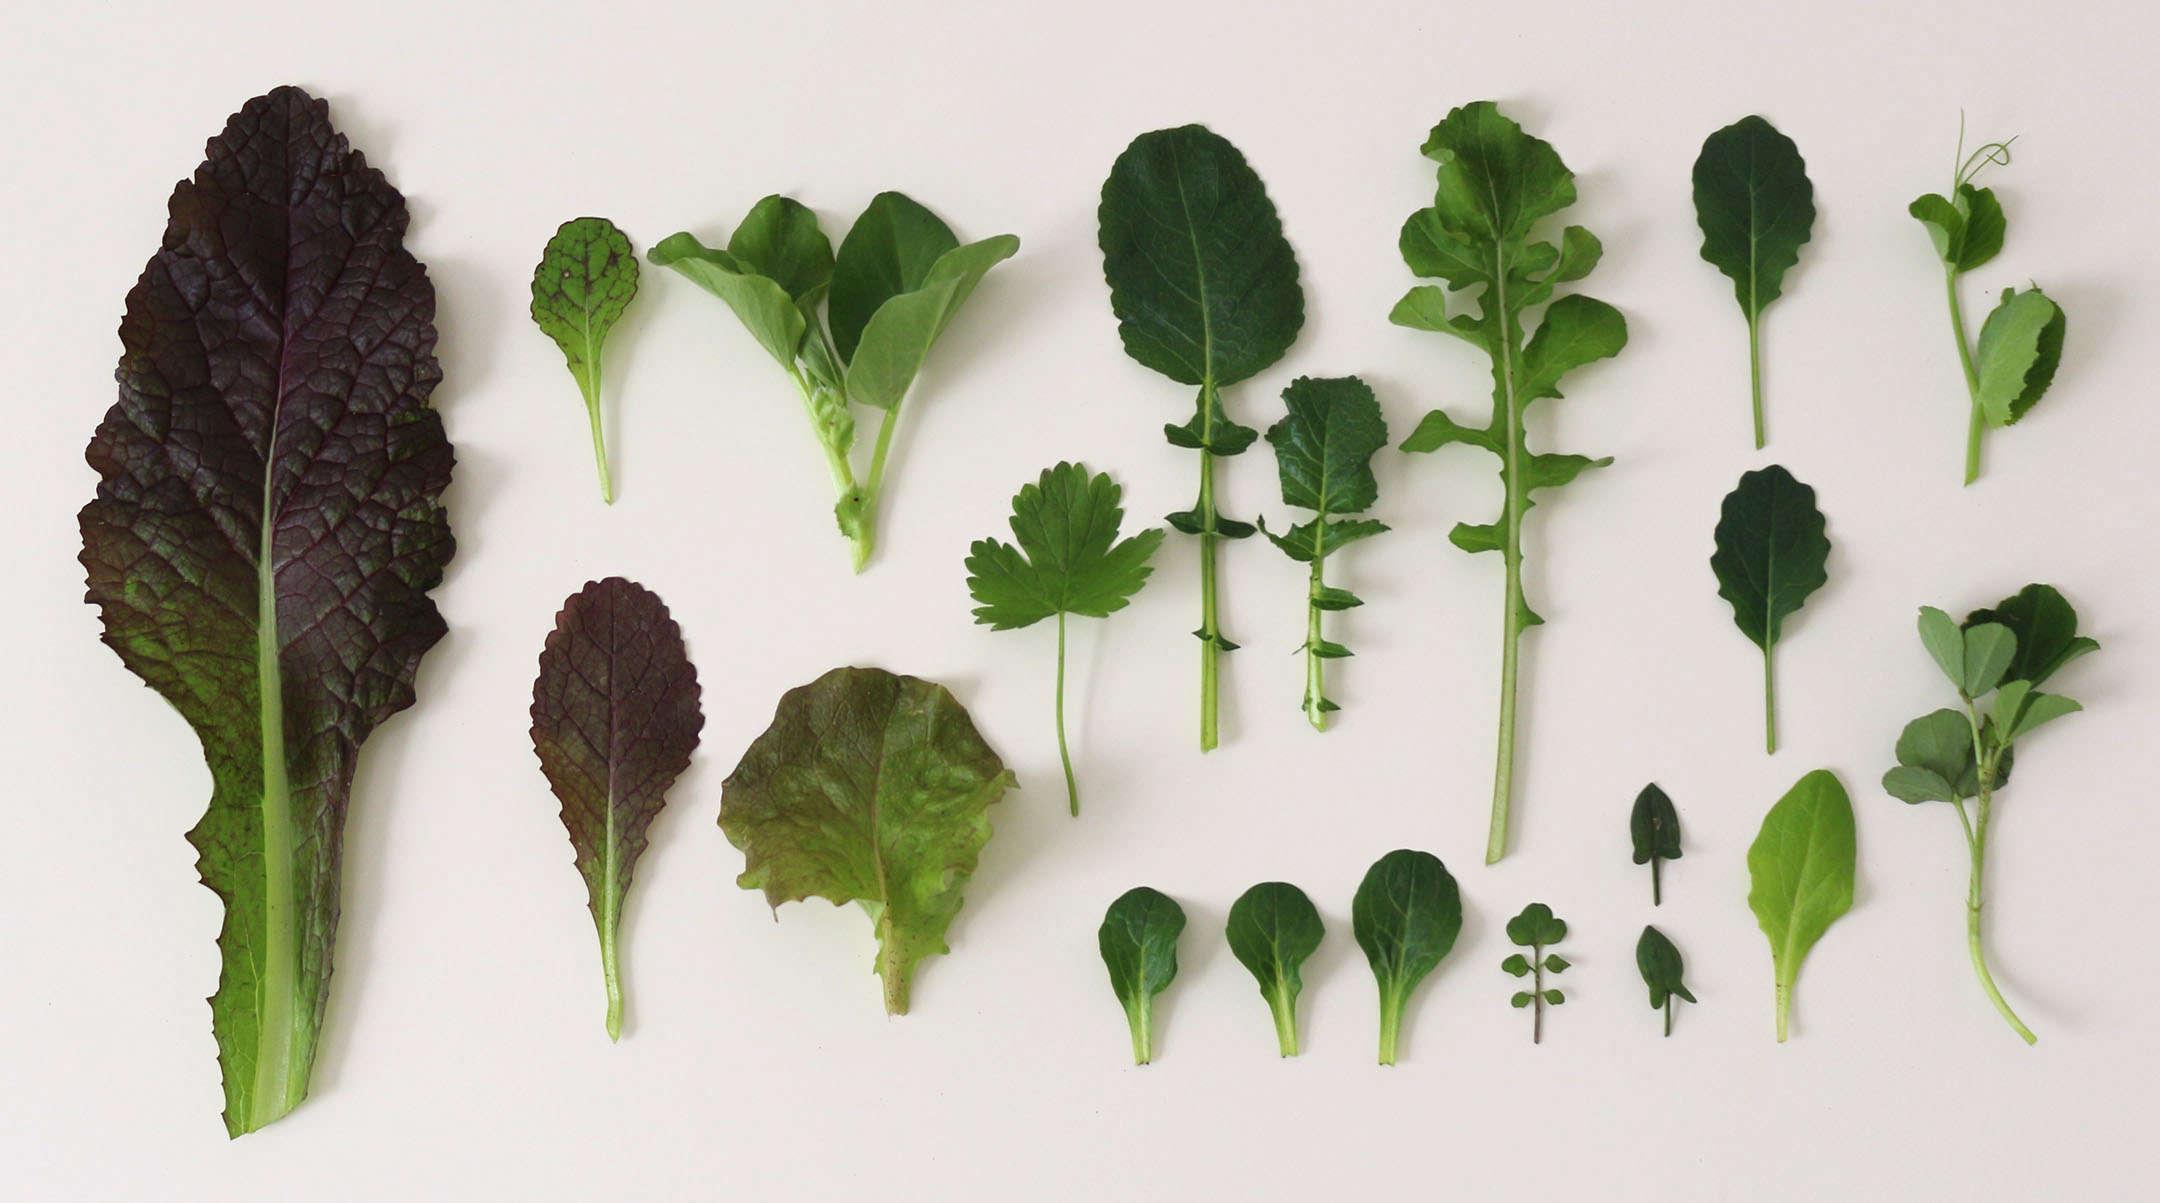 8 Winter Garden Greens to Grow Now